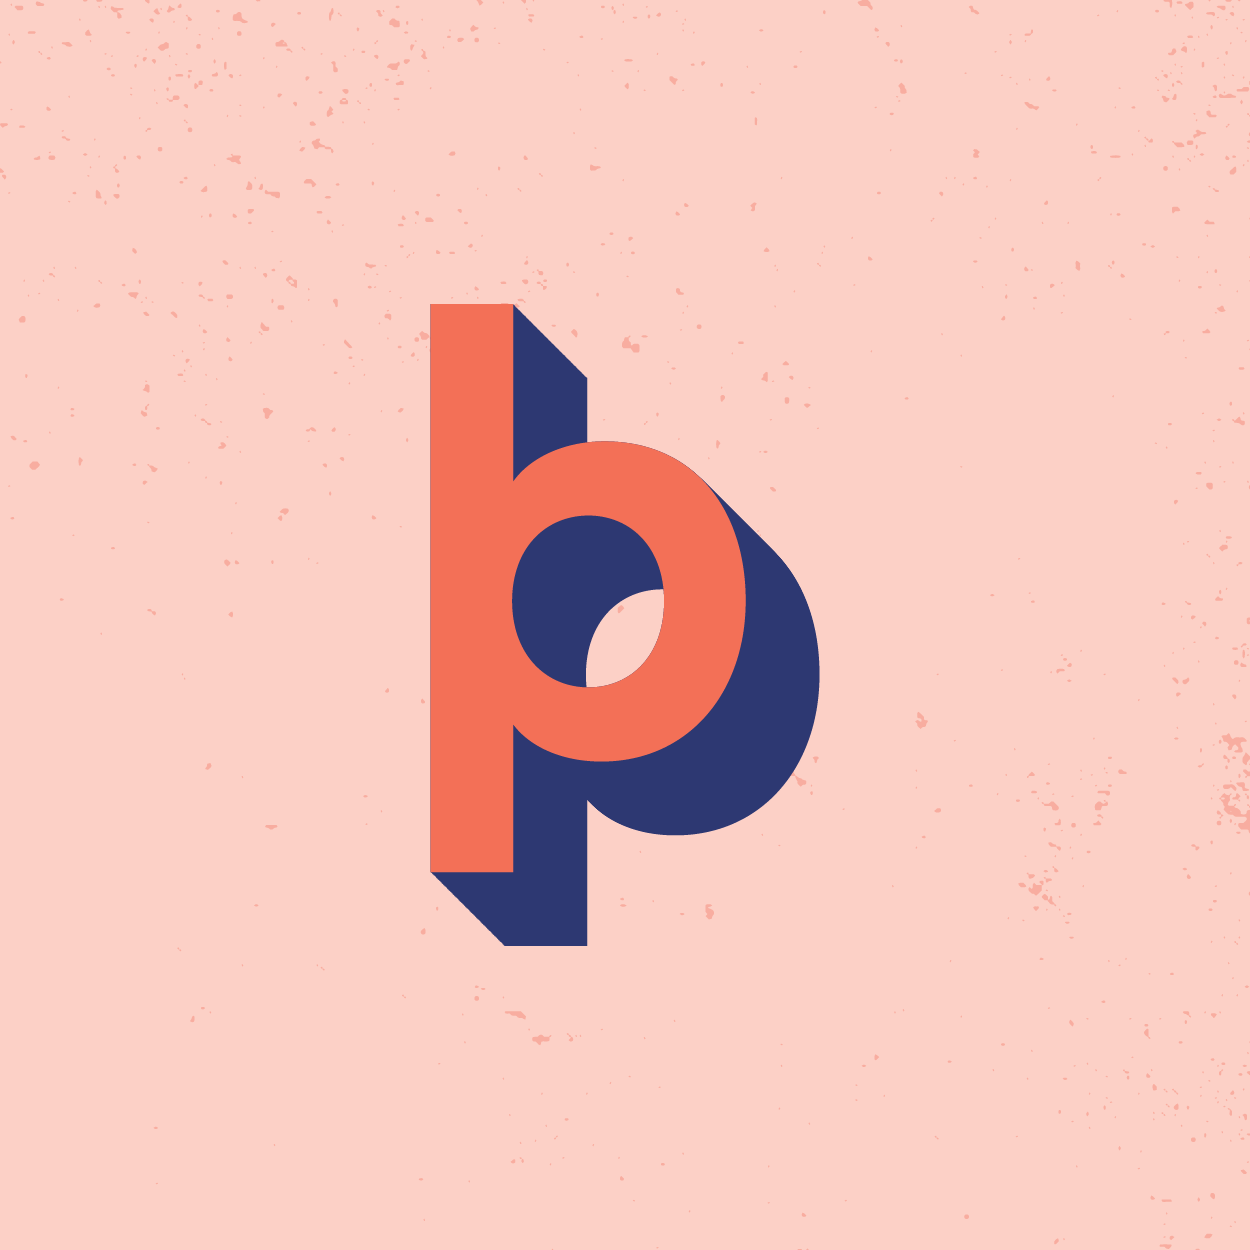 þorn-01.png